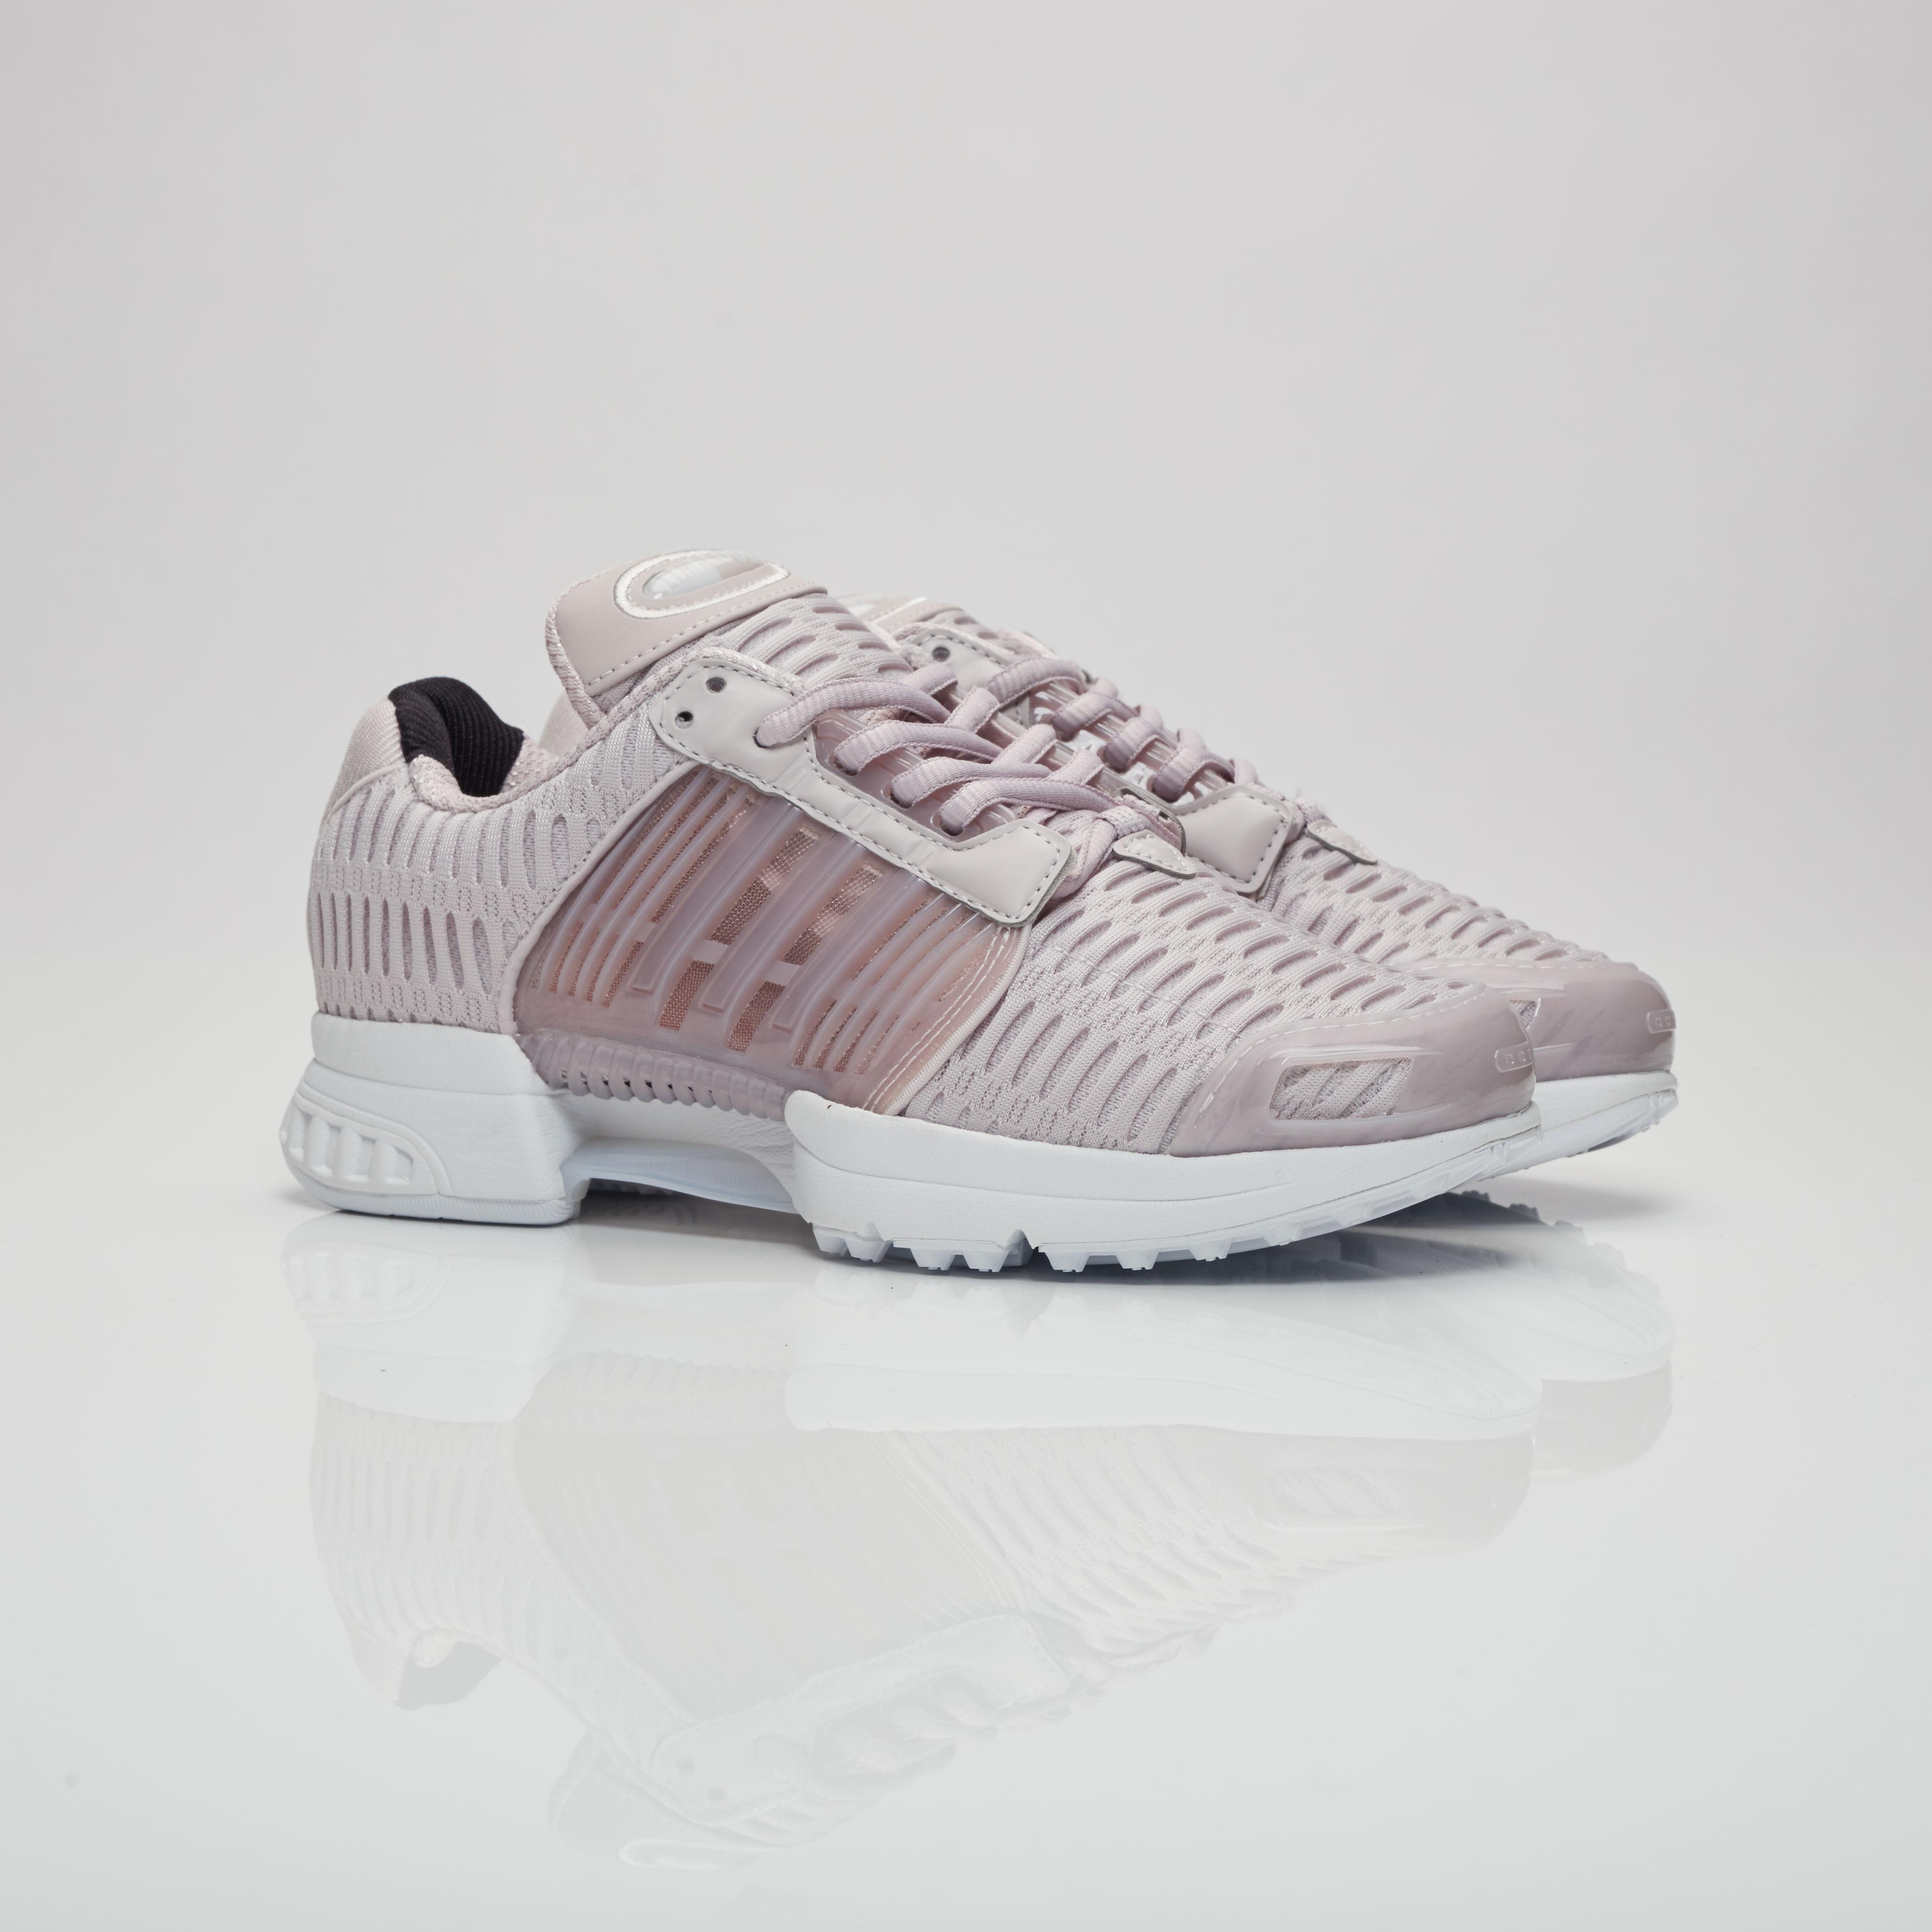 adidas Clima Cool 1 W - Bb5301 - SNS   sneakers & streetwear ...